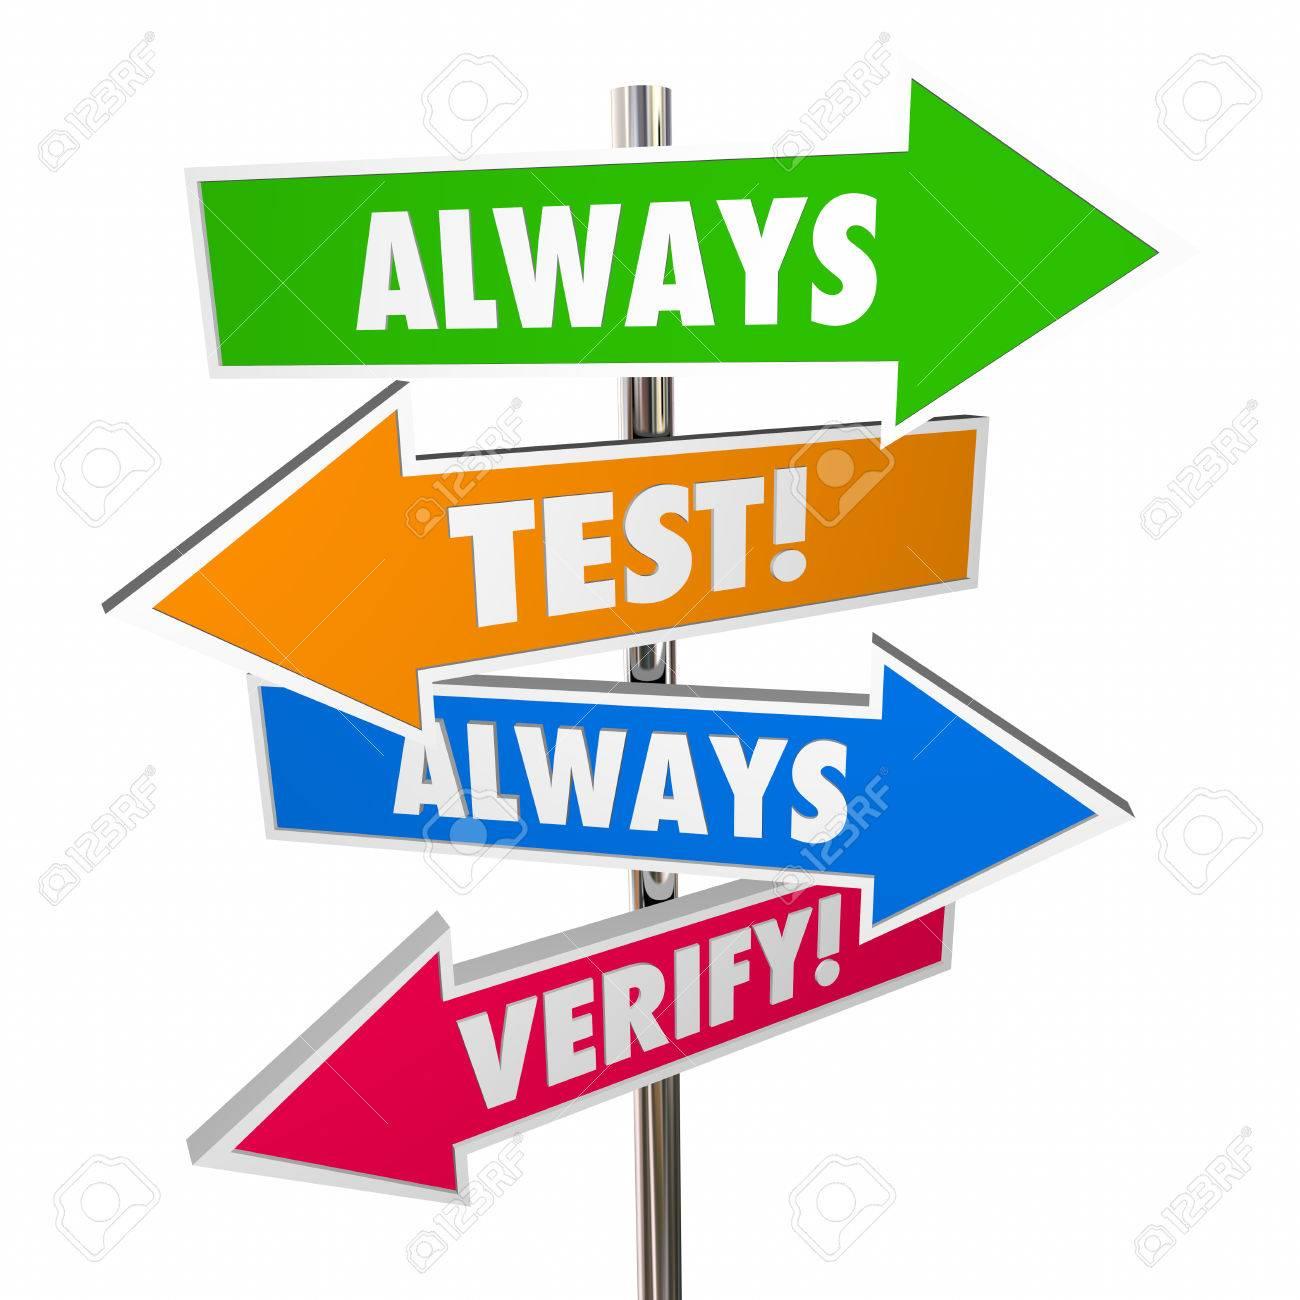 Assumptios clipart banner stock Always Test Verify Assumptions Hypothesis Theory Signs 3D » Clipart ... banner stock